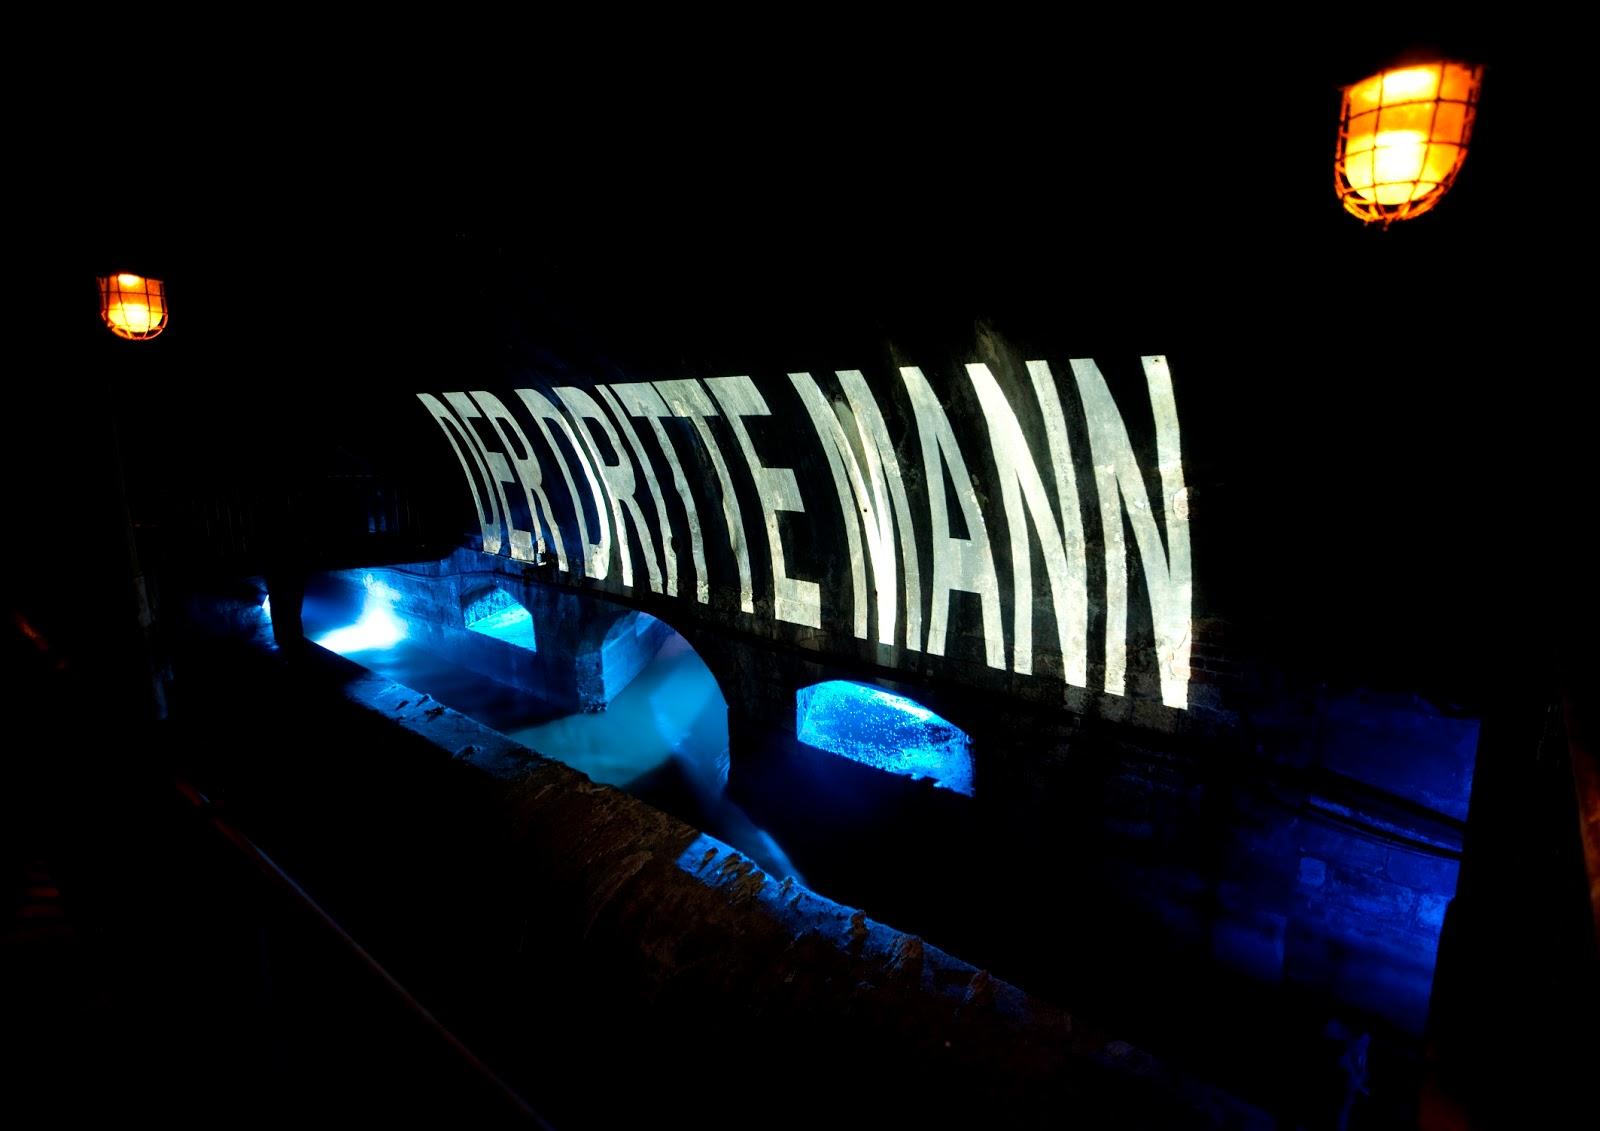 Dritte Mann Tour Wien